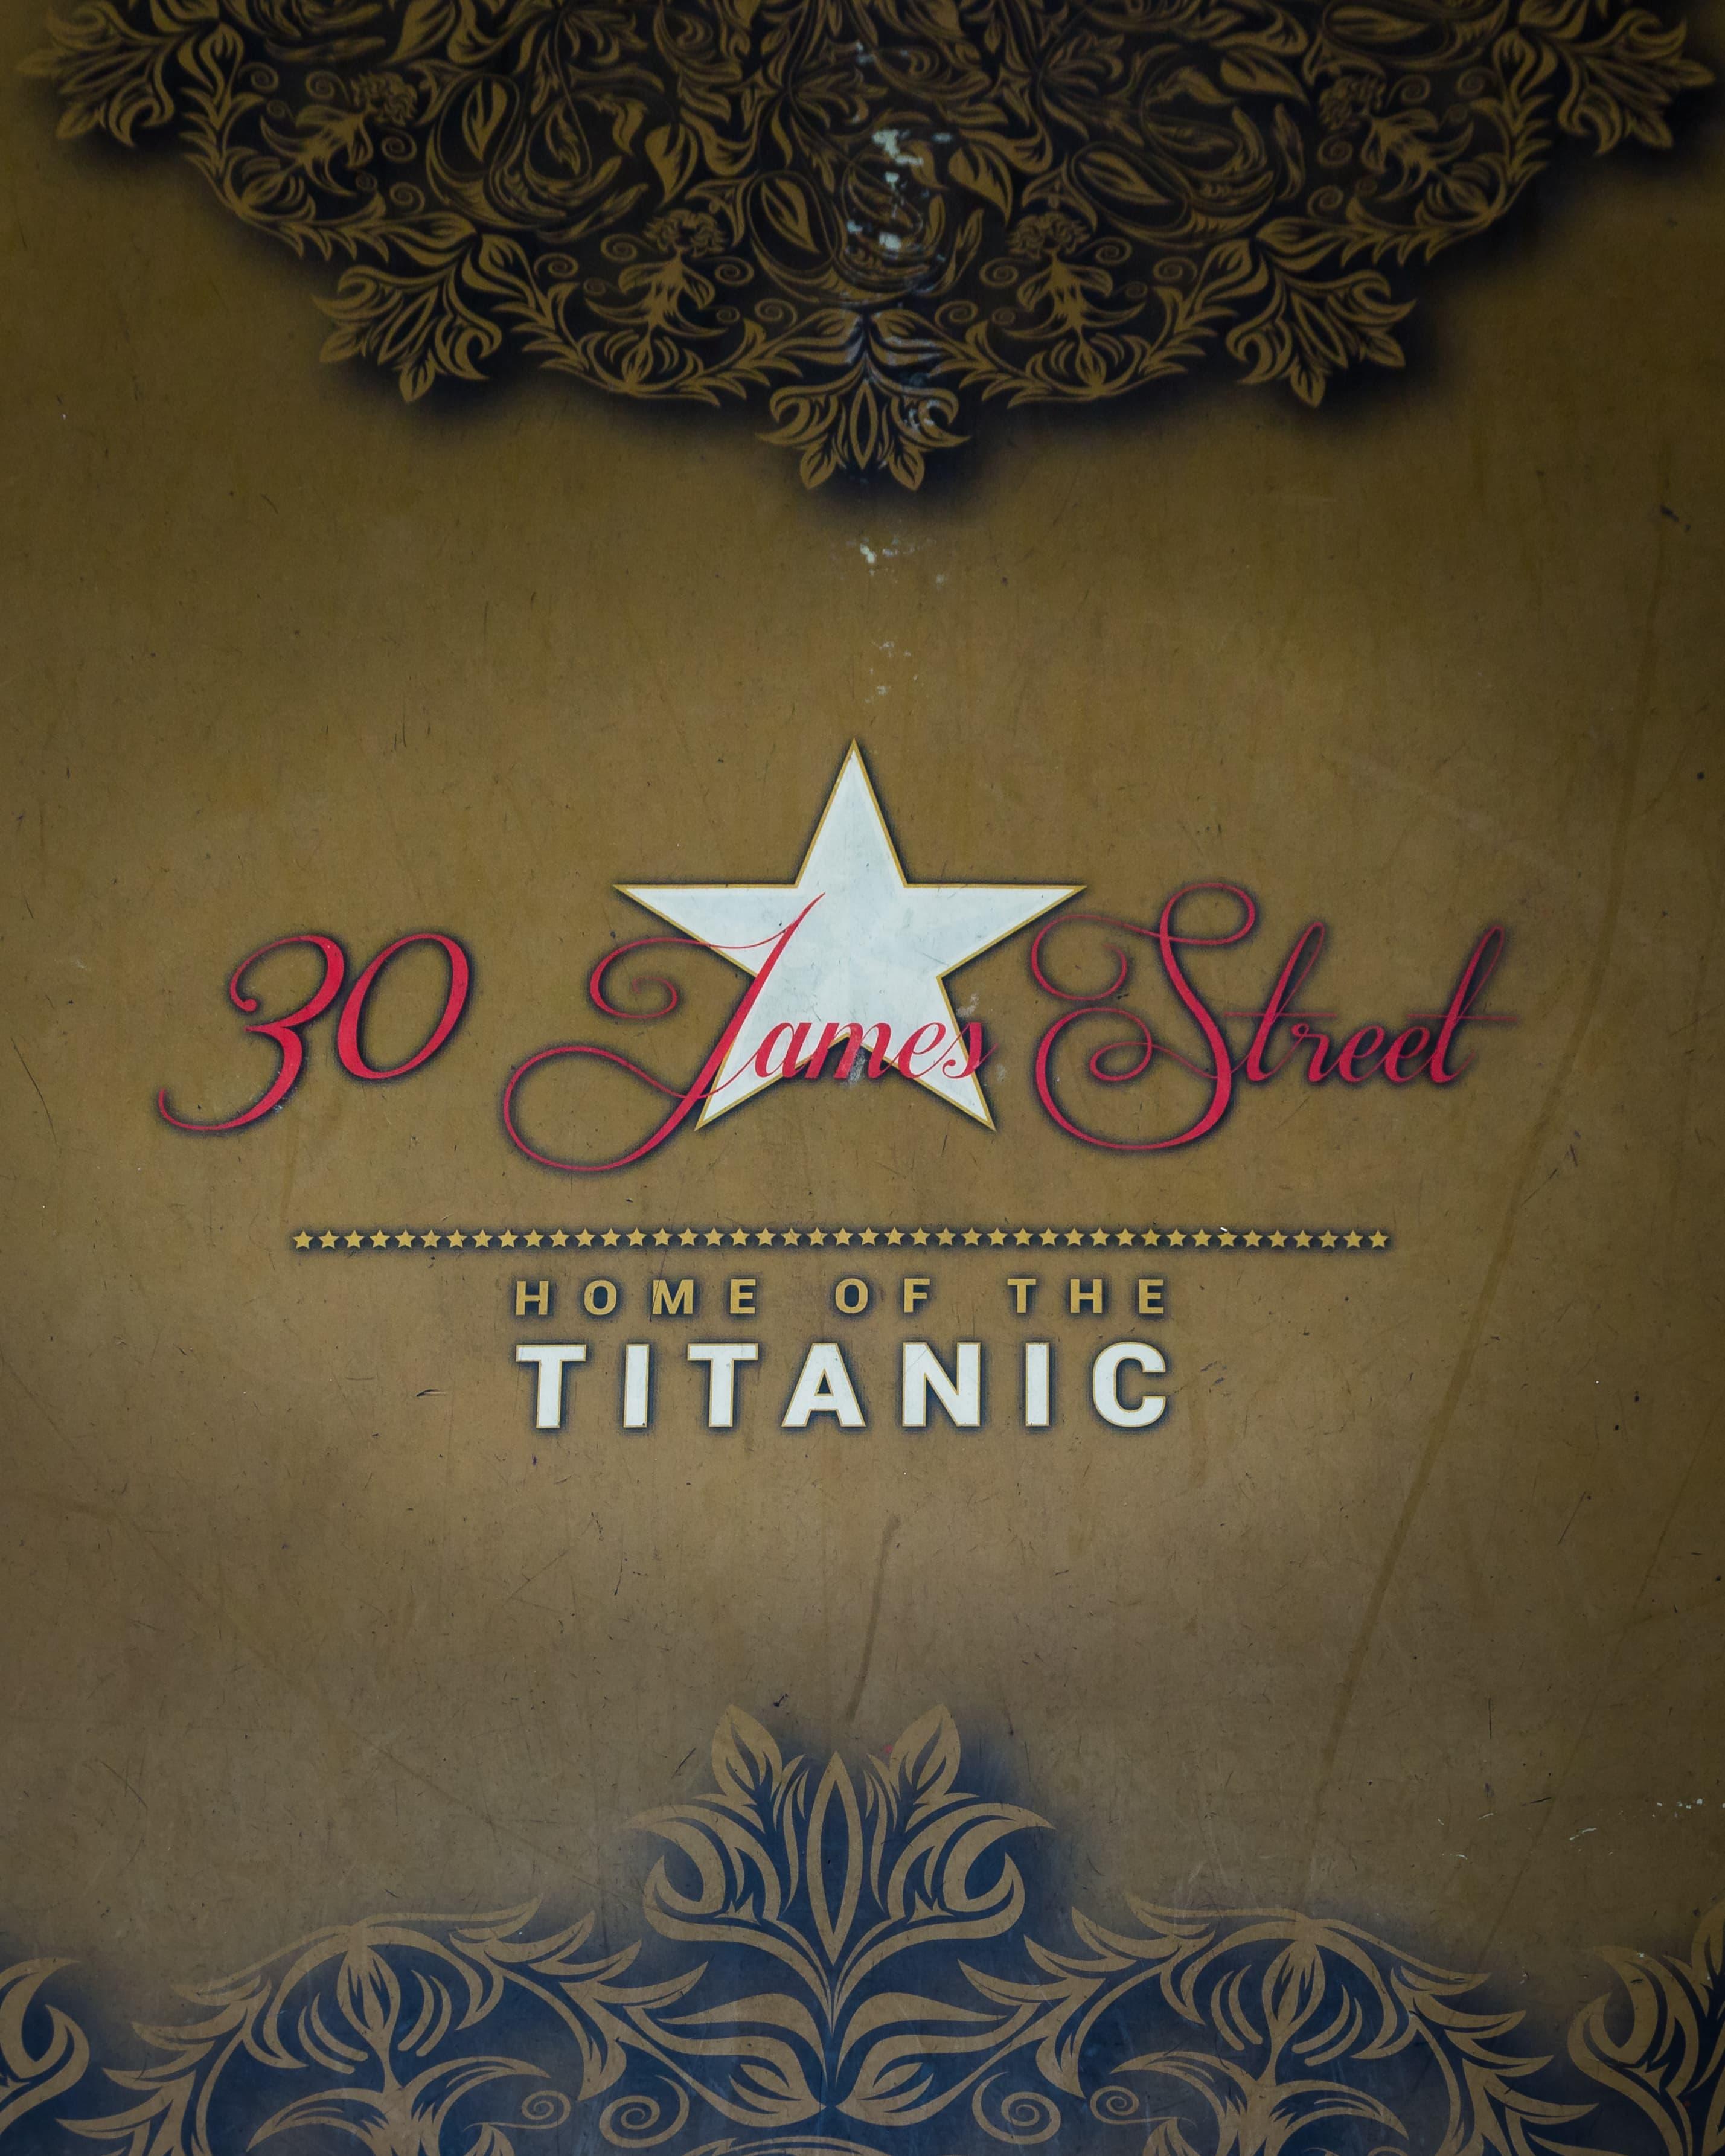 Wedding Venue 30 James Street home of the Titanic